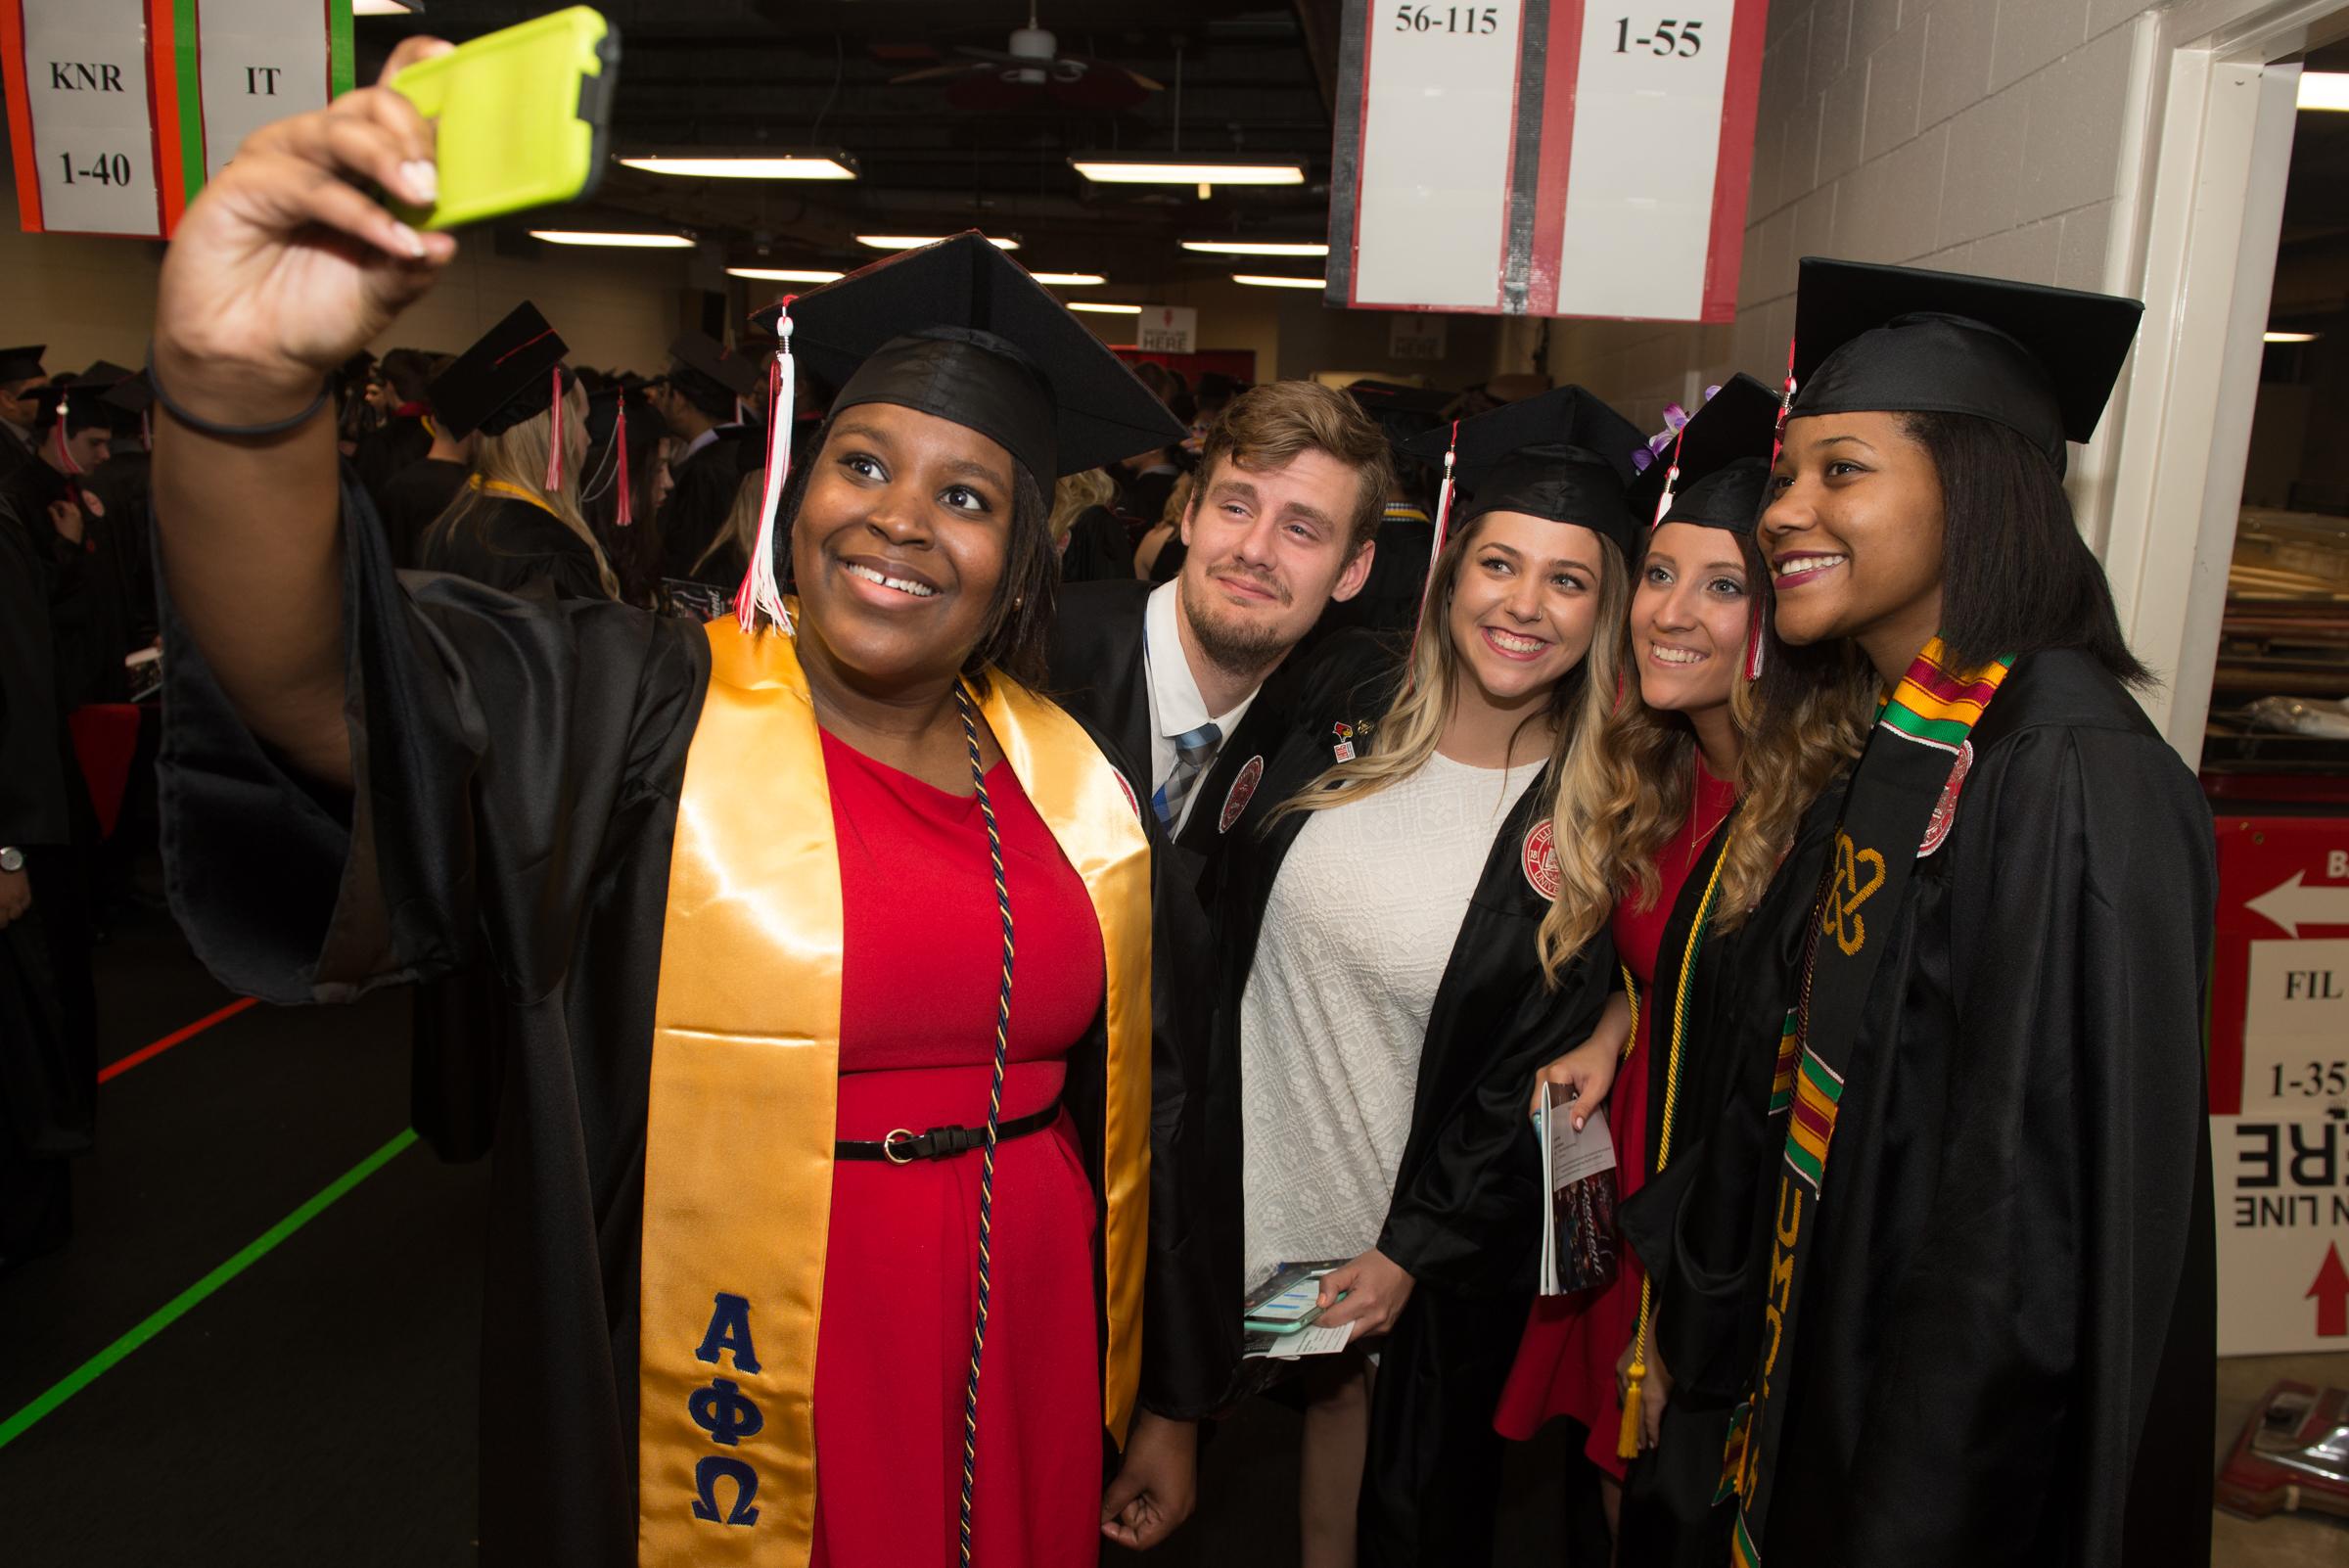 Students take a selfie